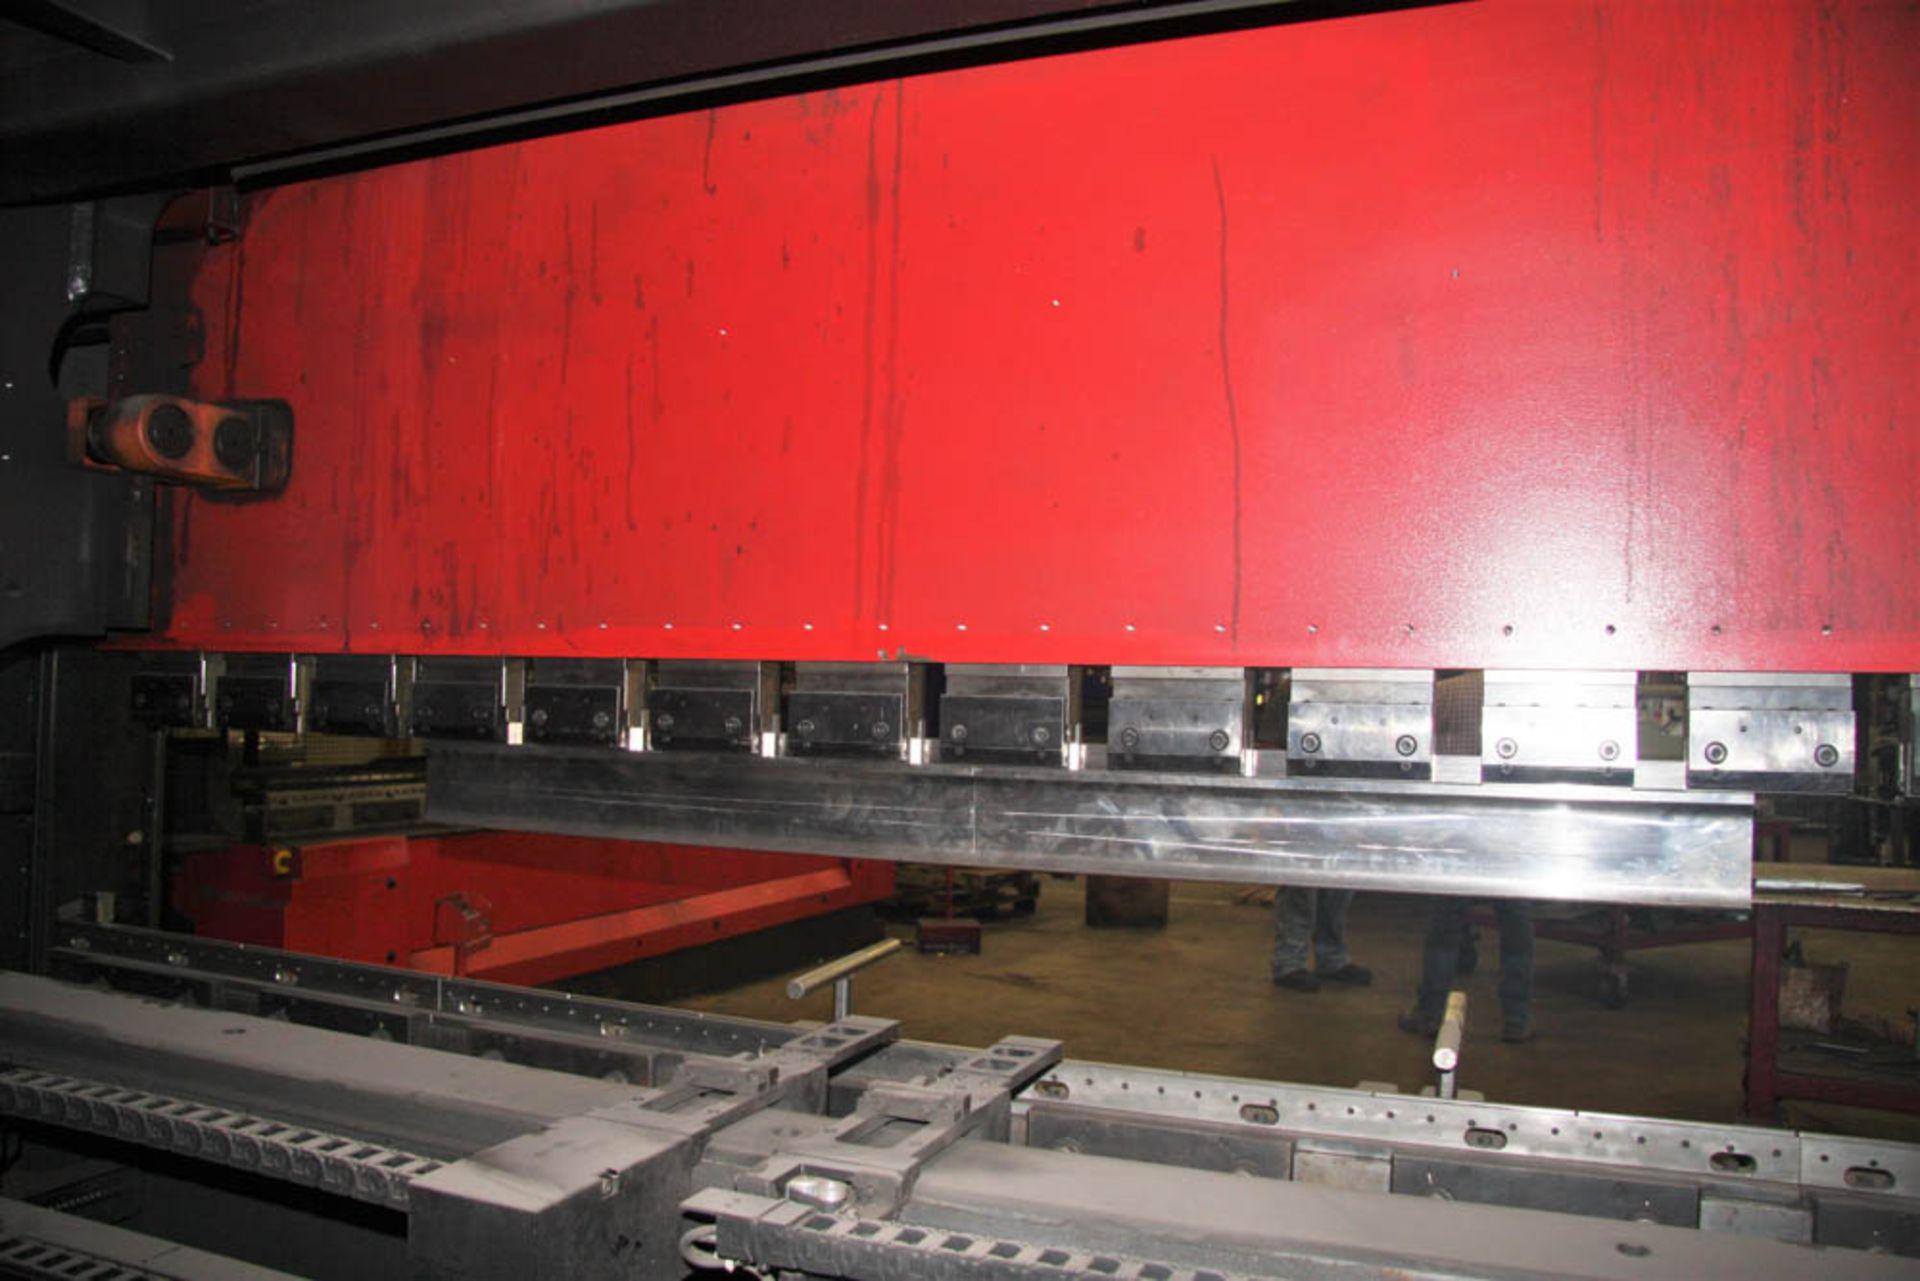 "2015 187 US TON X 122"" AMADA MDL. HG1703 CNC PRESS BRAKE, AMNC 3i CONTROL, 122"" MAX BEND LENGTH - Image 12 of 14"